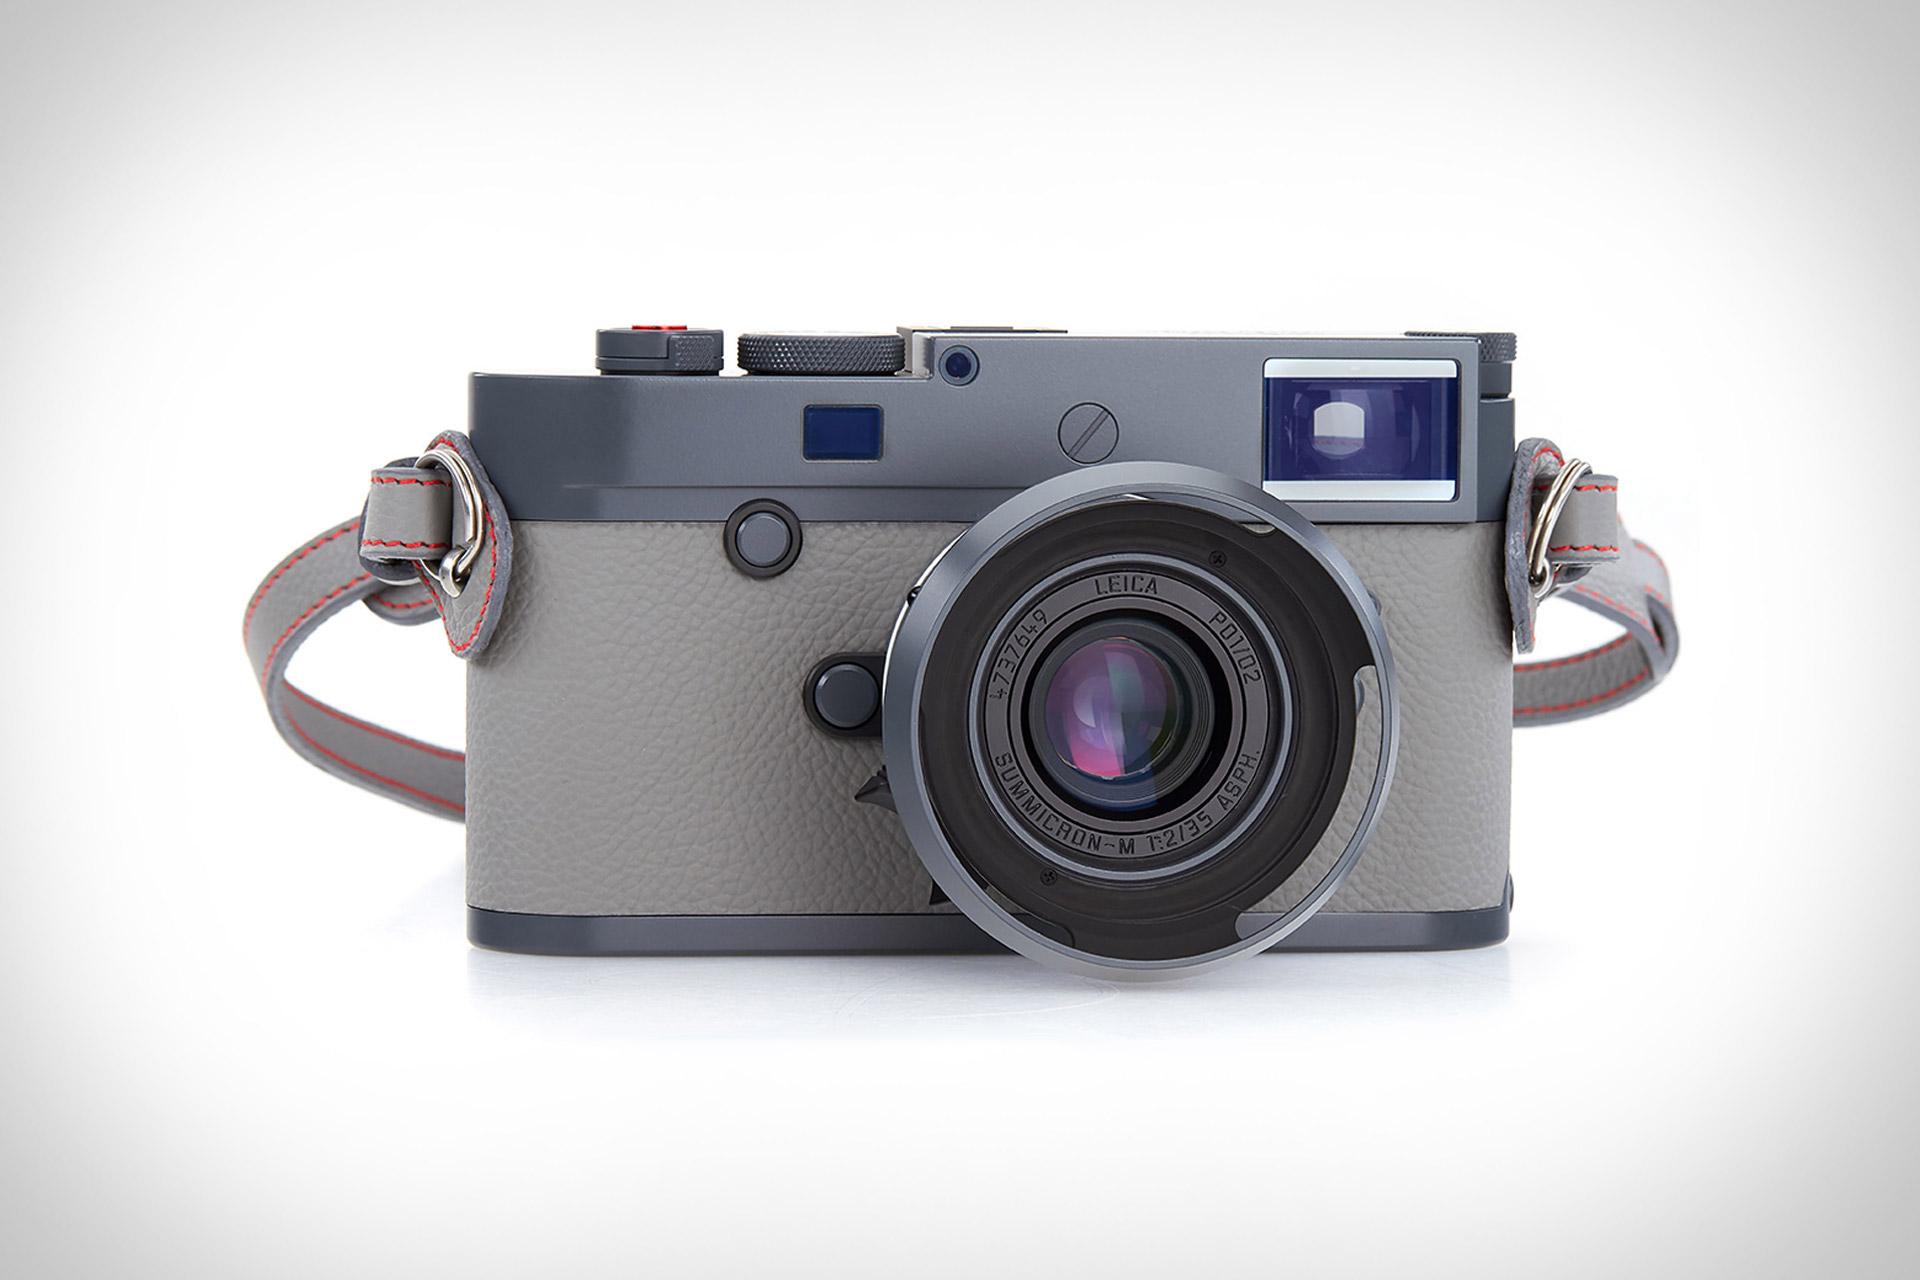 Leica Entfernungsmesser App : Leica geosystems disto d laser entfernungsmesser bluetooth